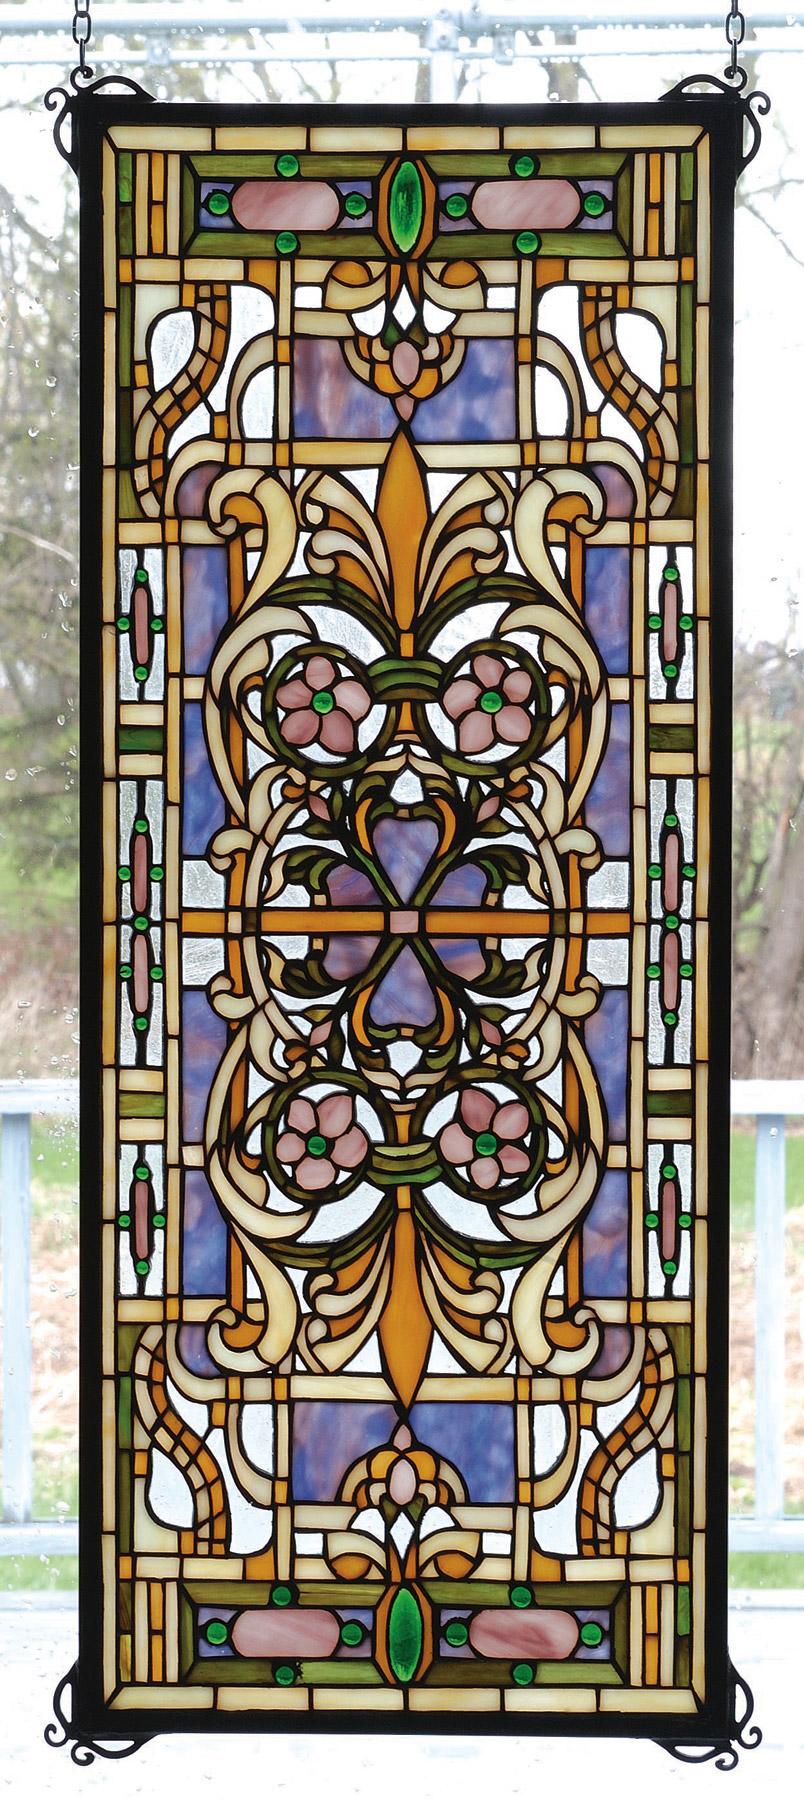 Meyda 98265 Tiffany Estate Floral Stained Glass Window